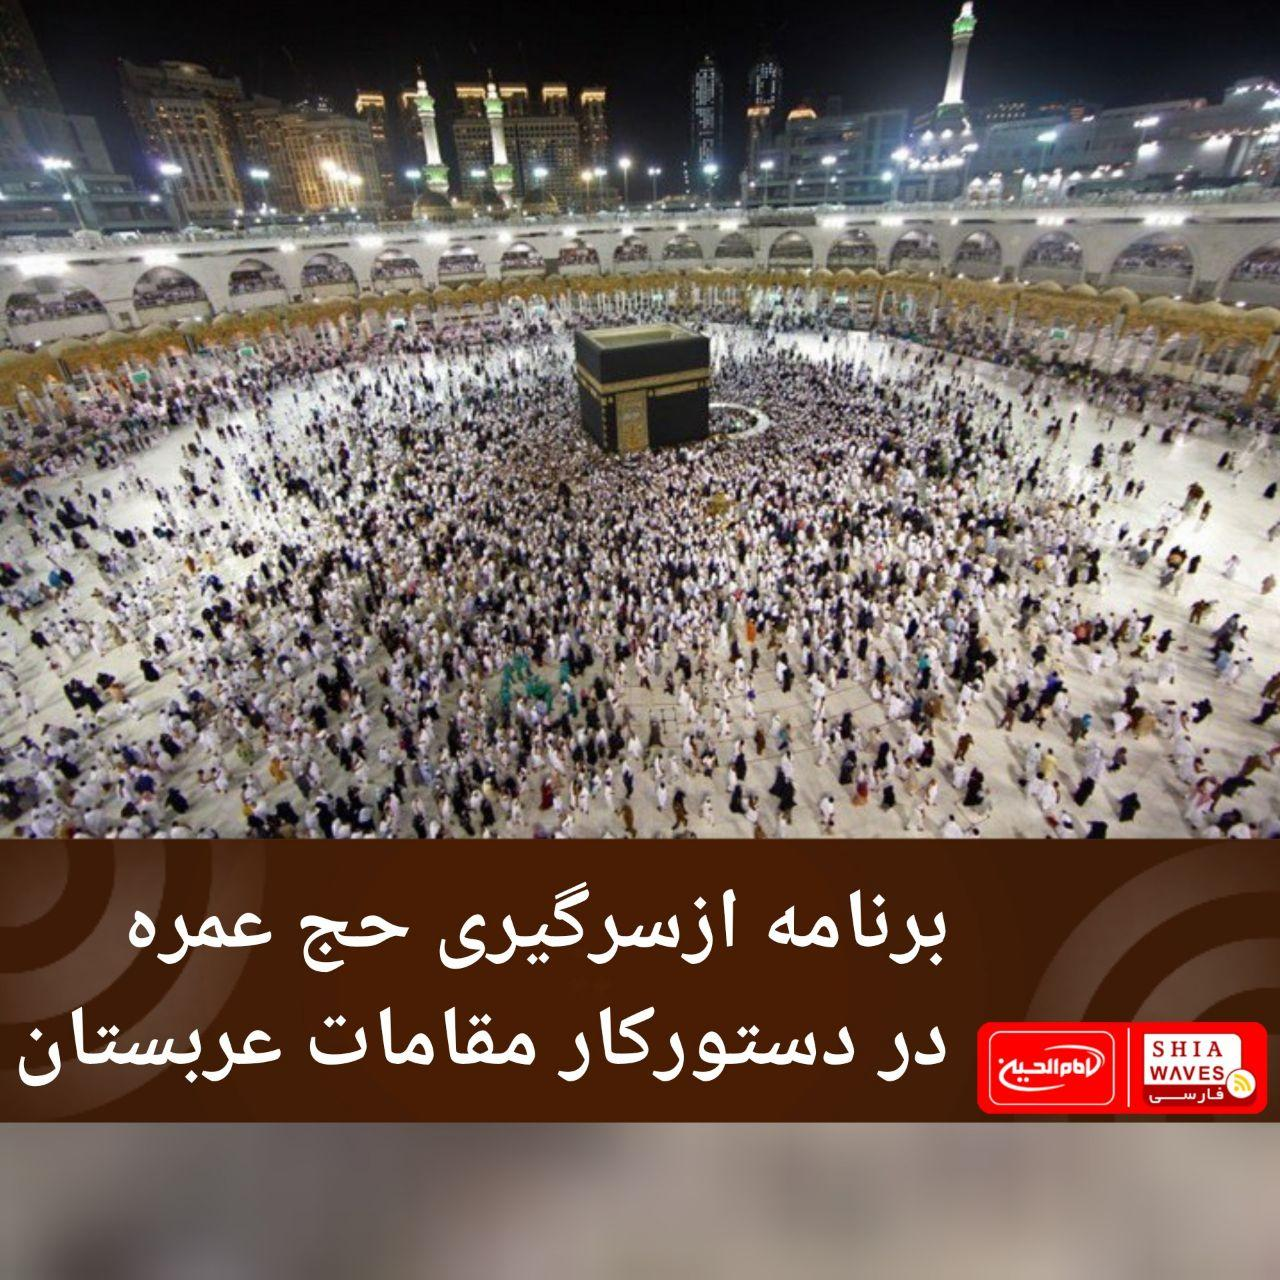 Photo of برنامه ازسرگیری حج عمره در دستورکار مقامات عربستان